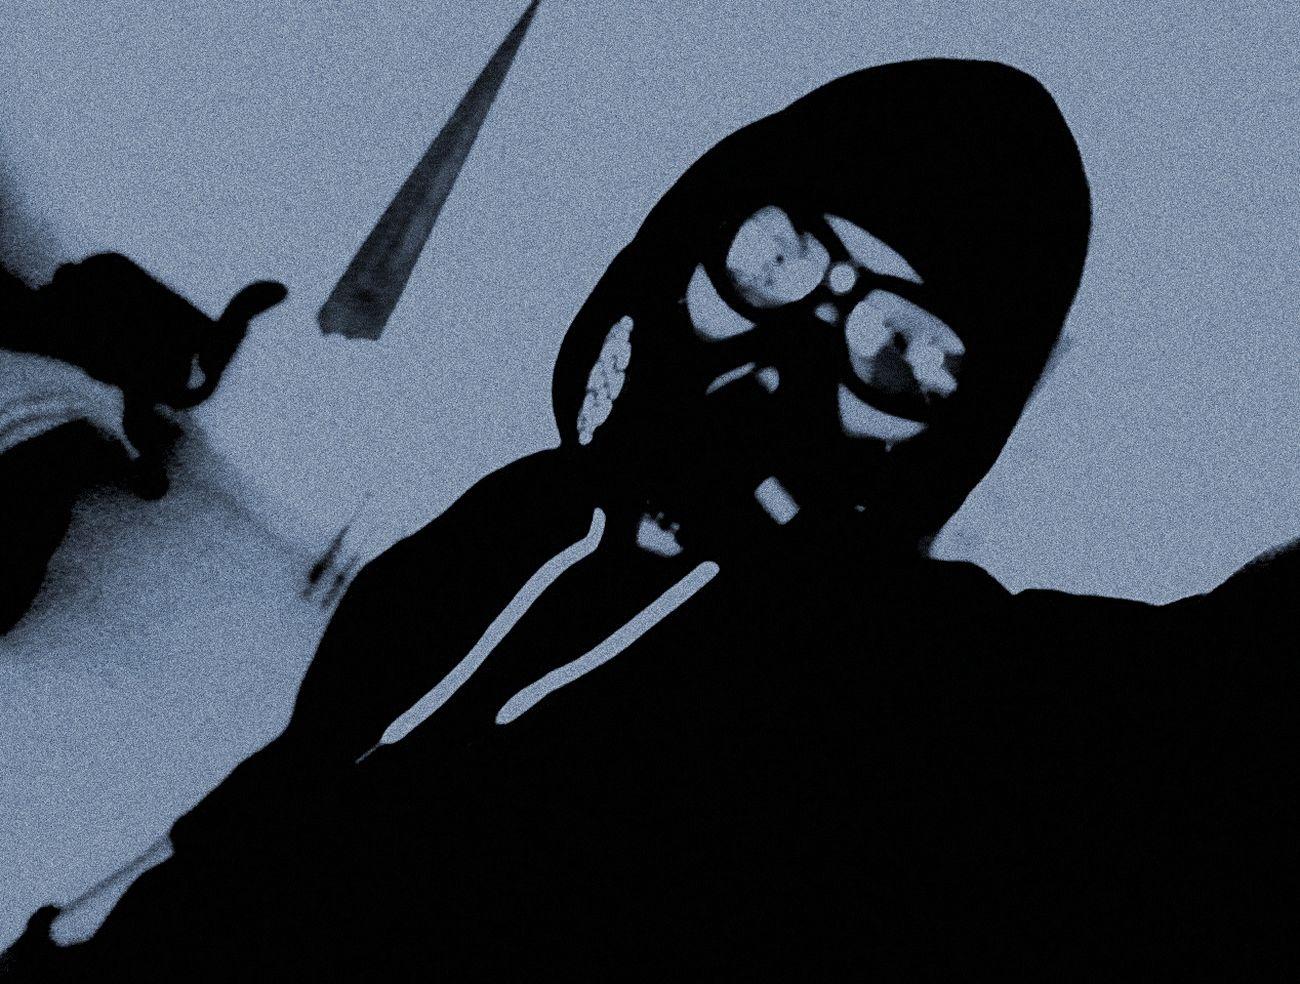 Blackandwhite Style GraffStyle Gasmask Gasmasks Gasmaskonface Selfie